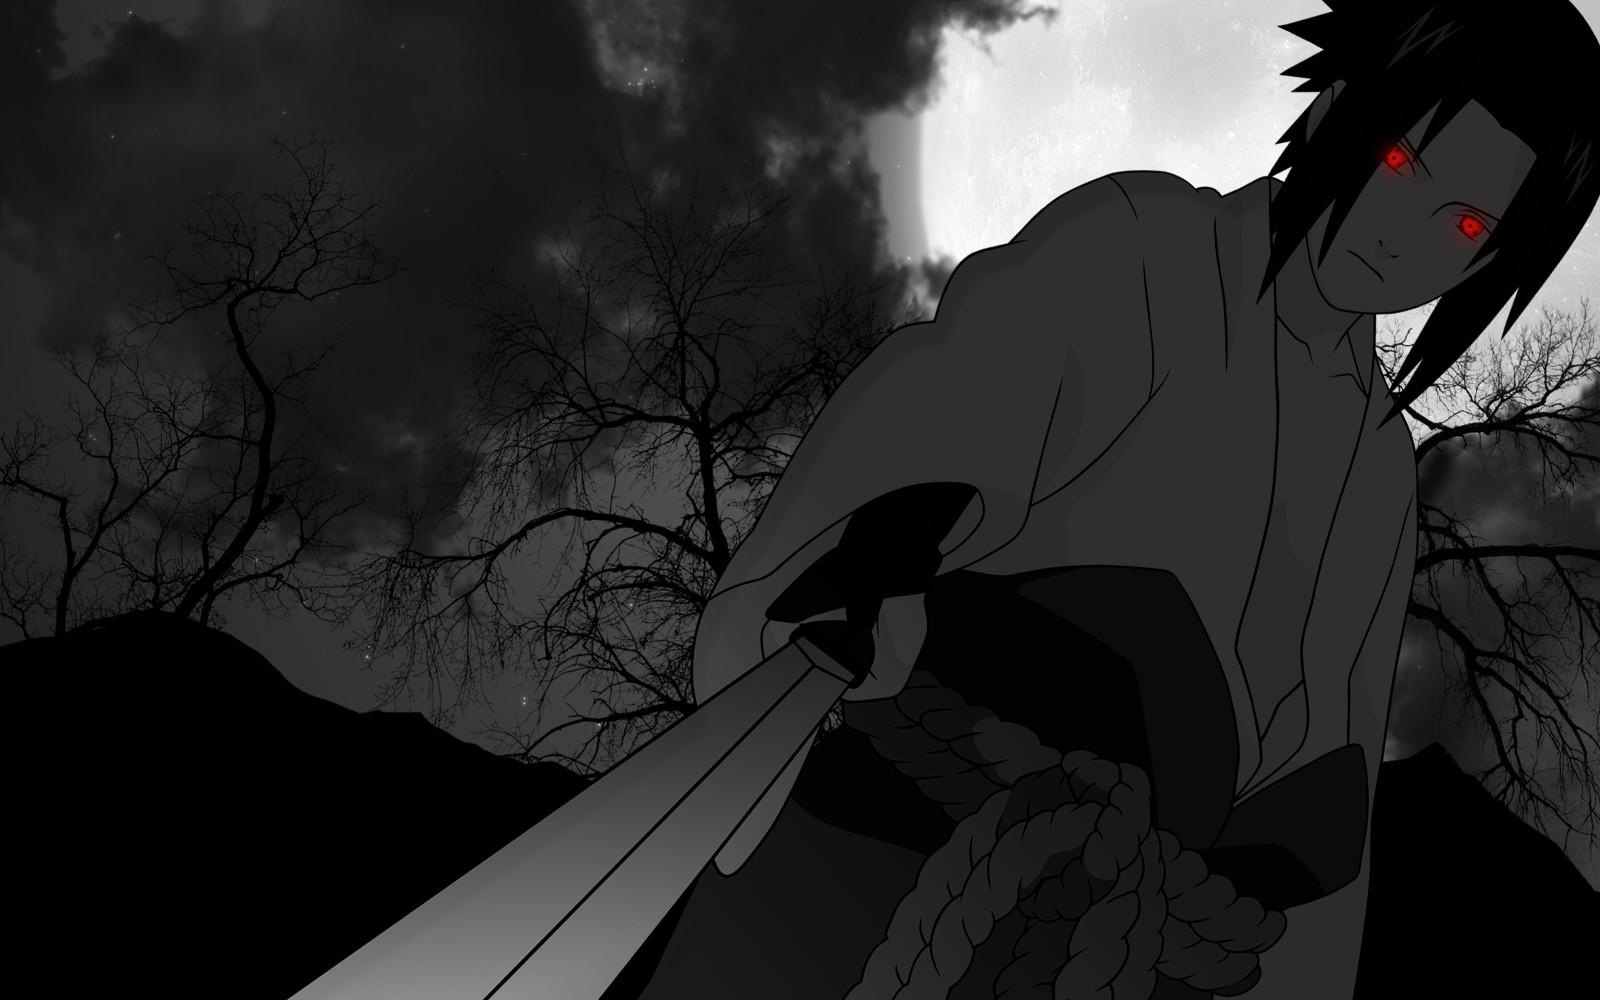 Fond D Ecran Monochrome Anime Yeux Brillants Naruto Shippuuden Sharingan Uchiha Sasuke Minuit Obscurite Capture D Ecran Noir Et Blanc Photographie Monochrome Personnage Fictif 1600x1000 Questionablecontext 243672 Fond D Ecran Wallhere